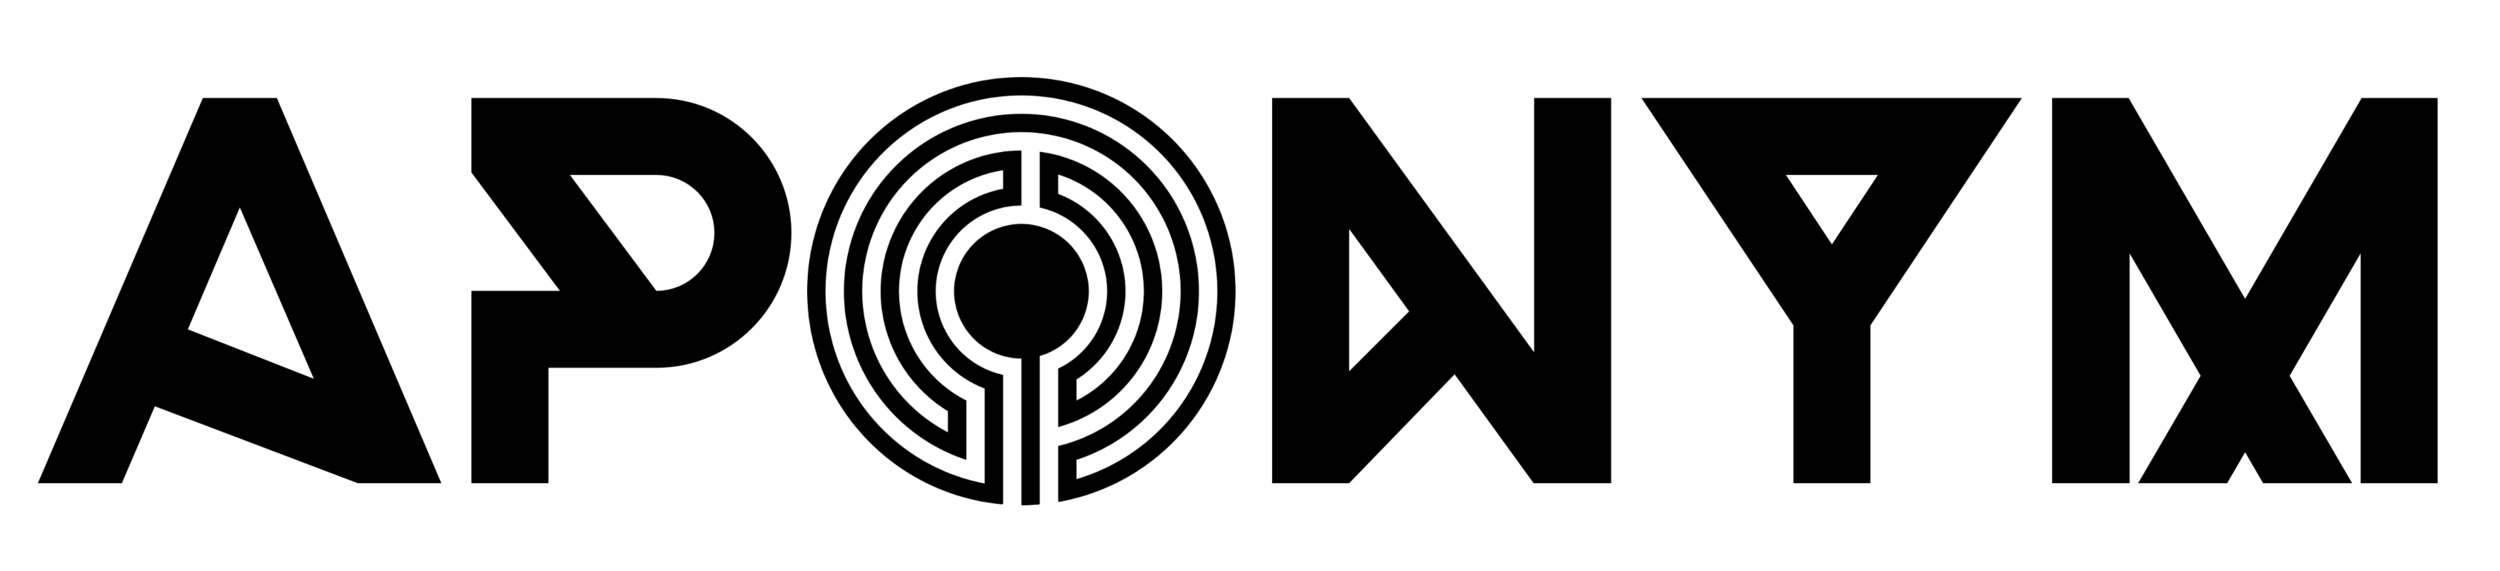 Font Logo O.png